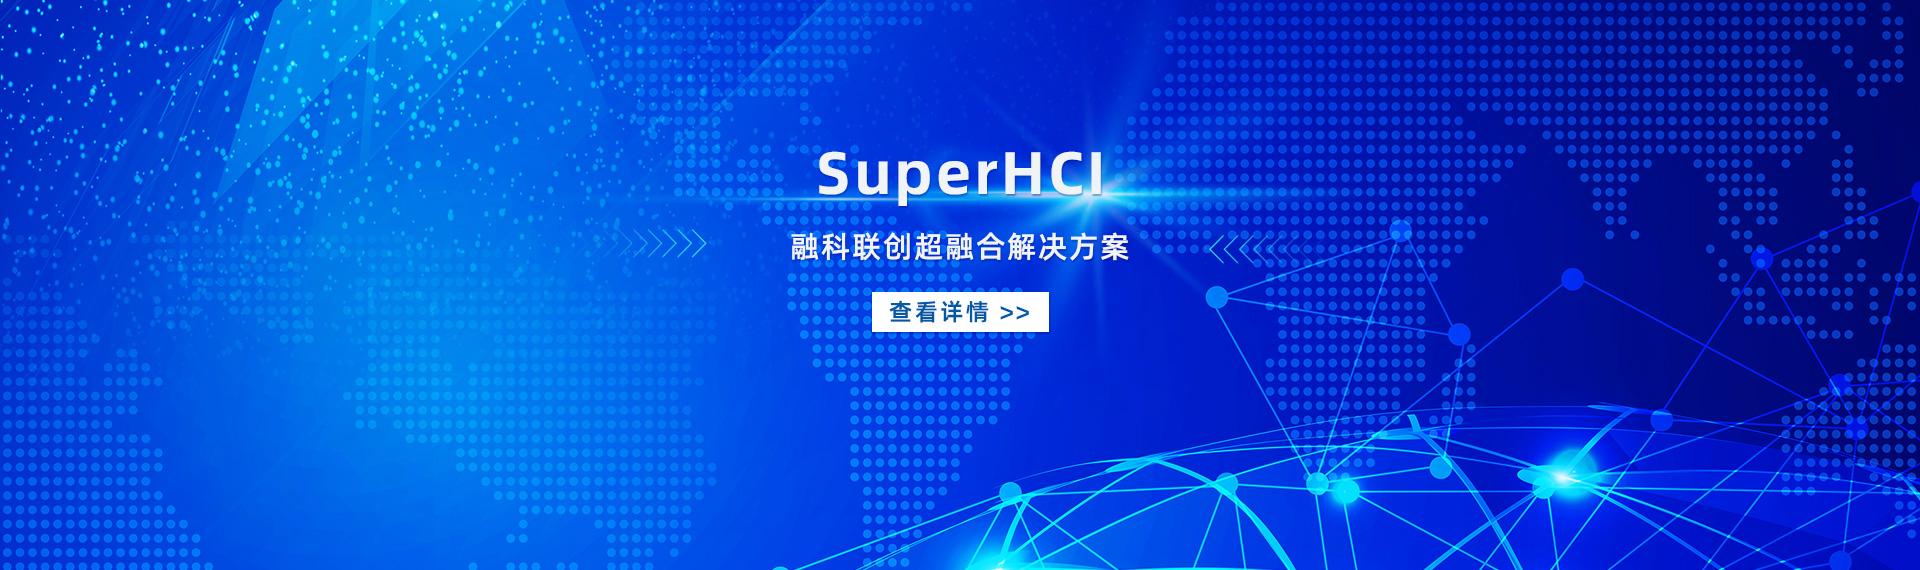 SuperHCI融科联创超融合解决方案